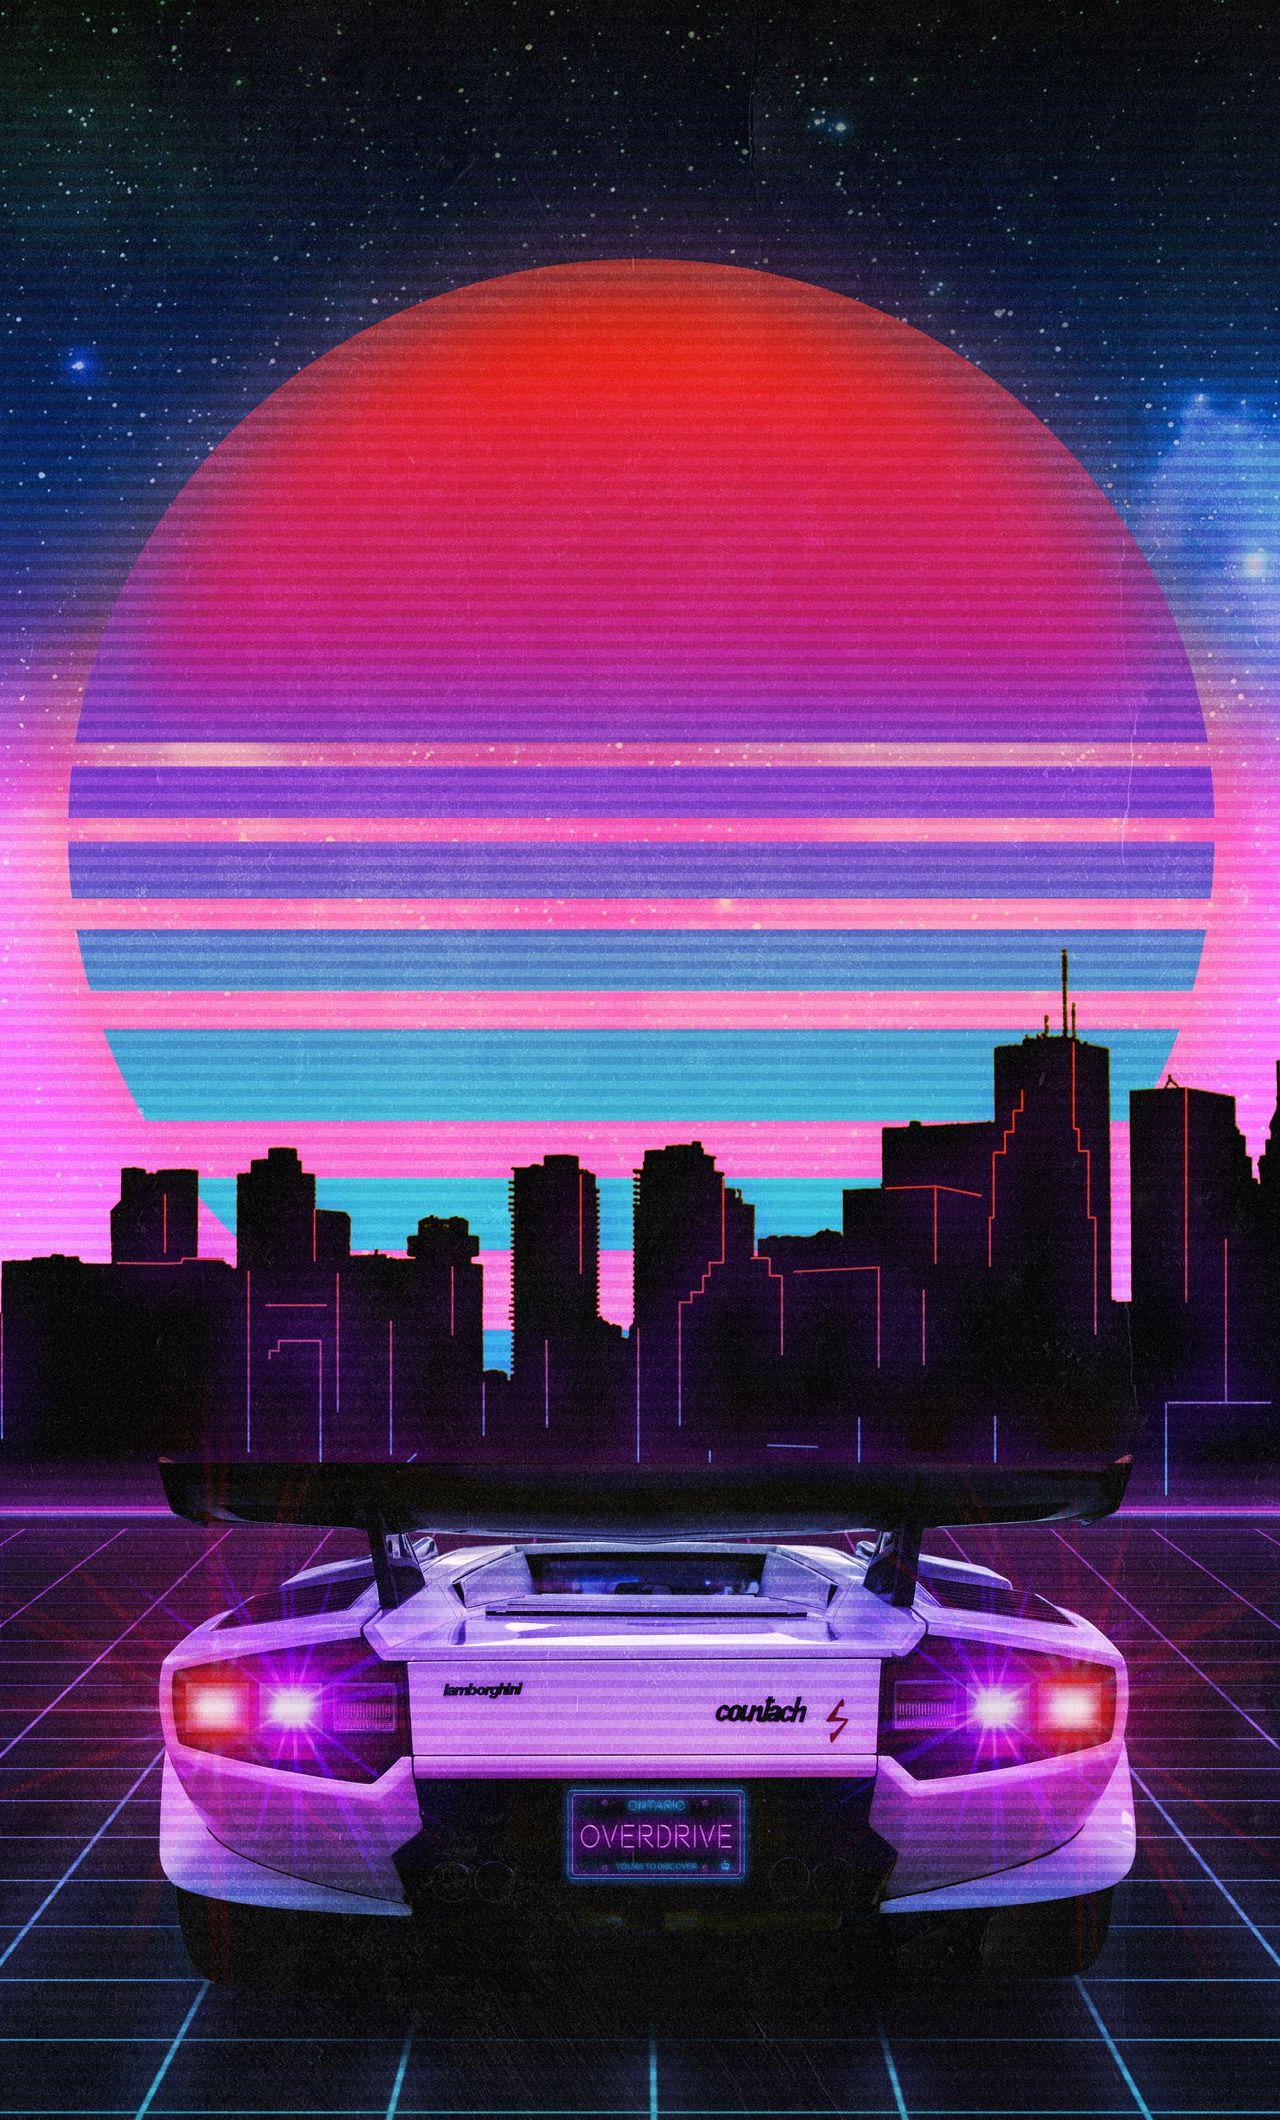 1280X2120 Retro Wave Lamborghini Neon City 5K Iphone 6 Hd 4K 1280x2120